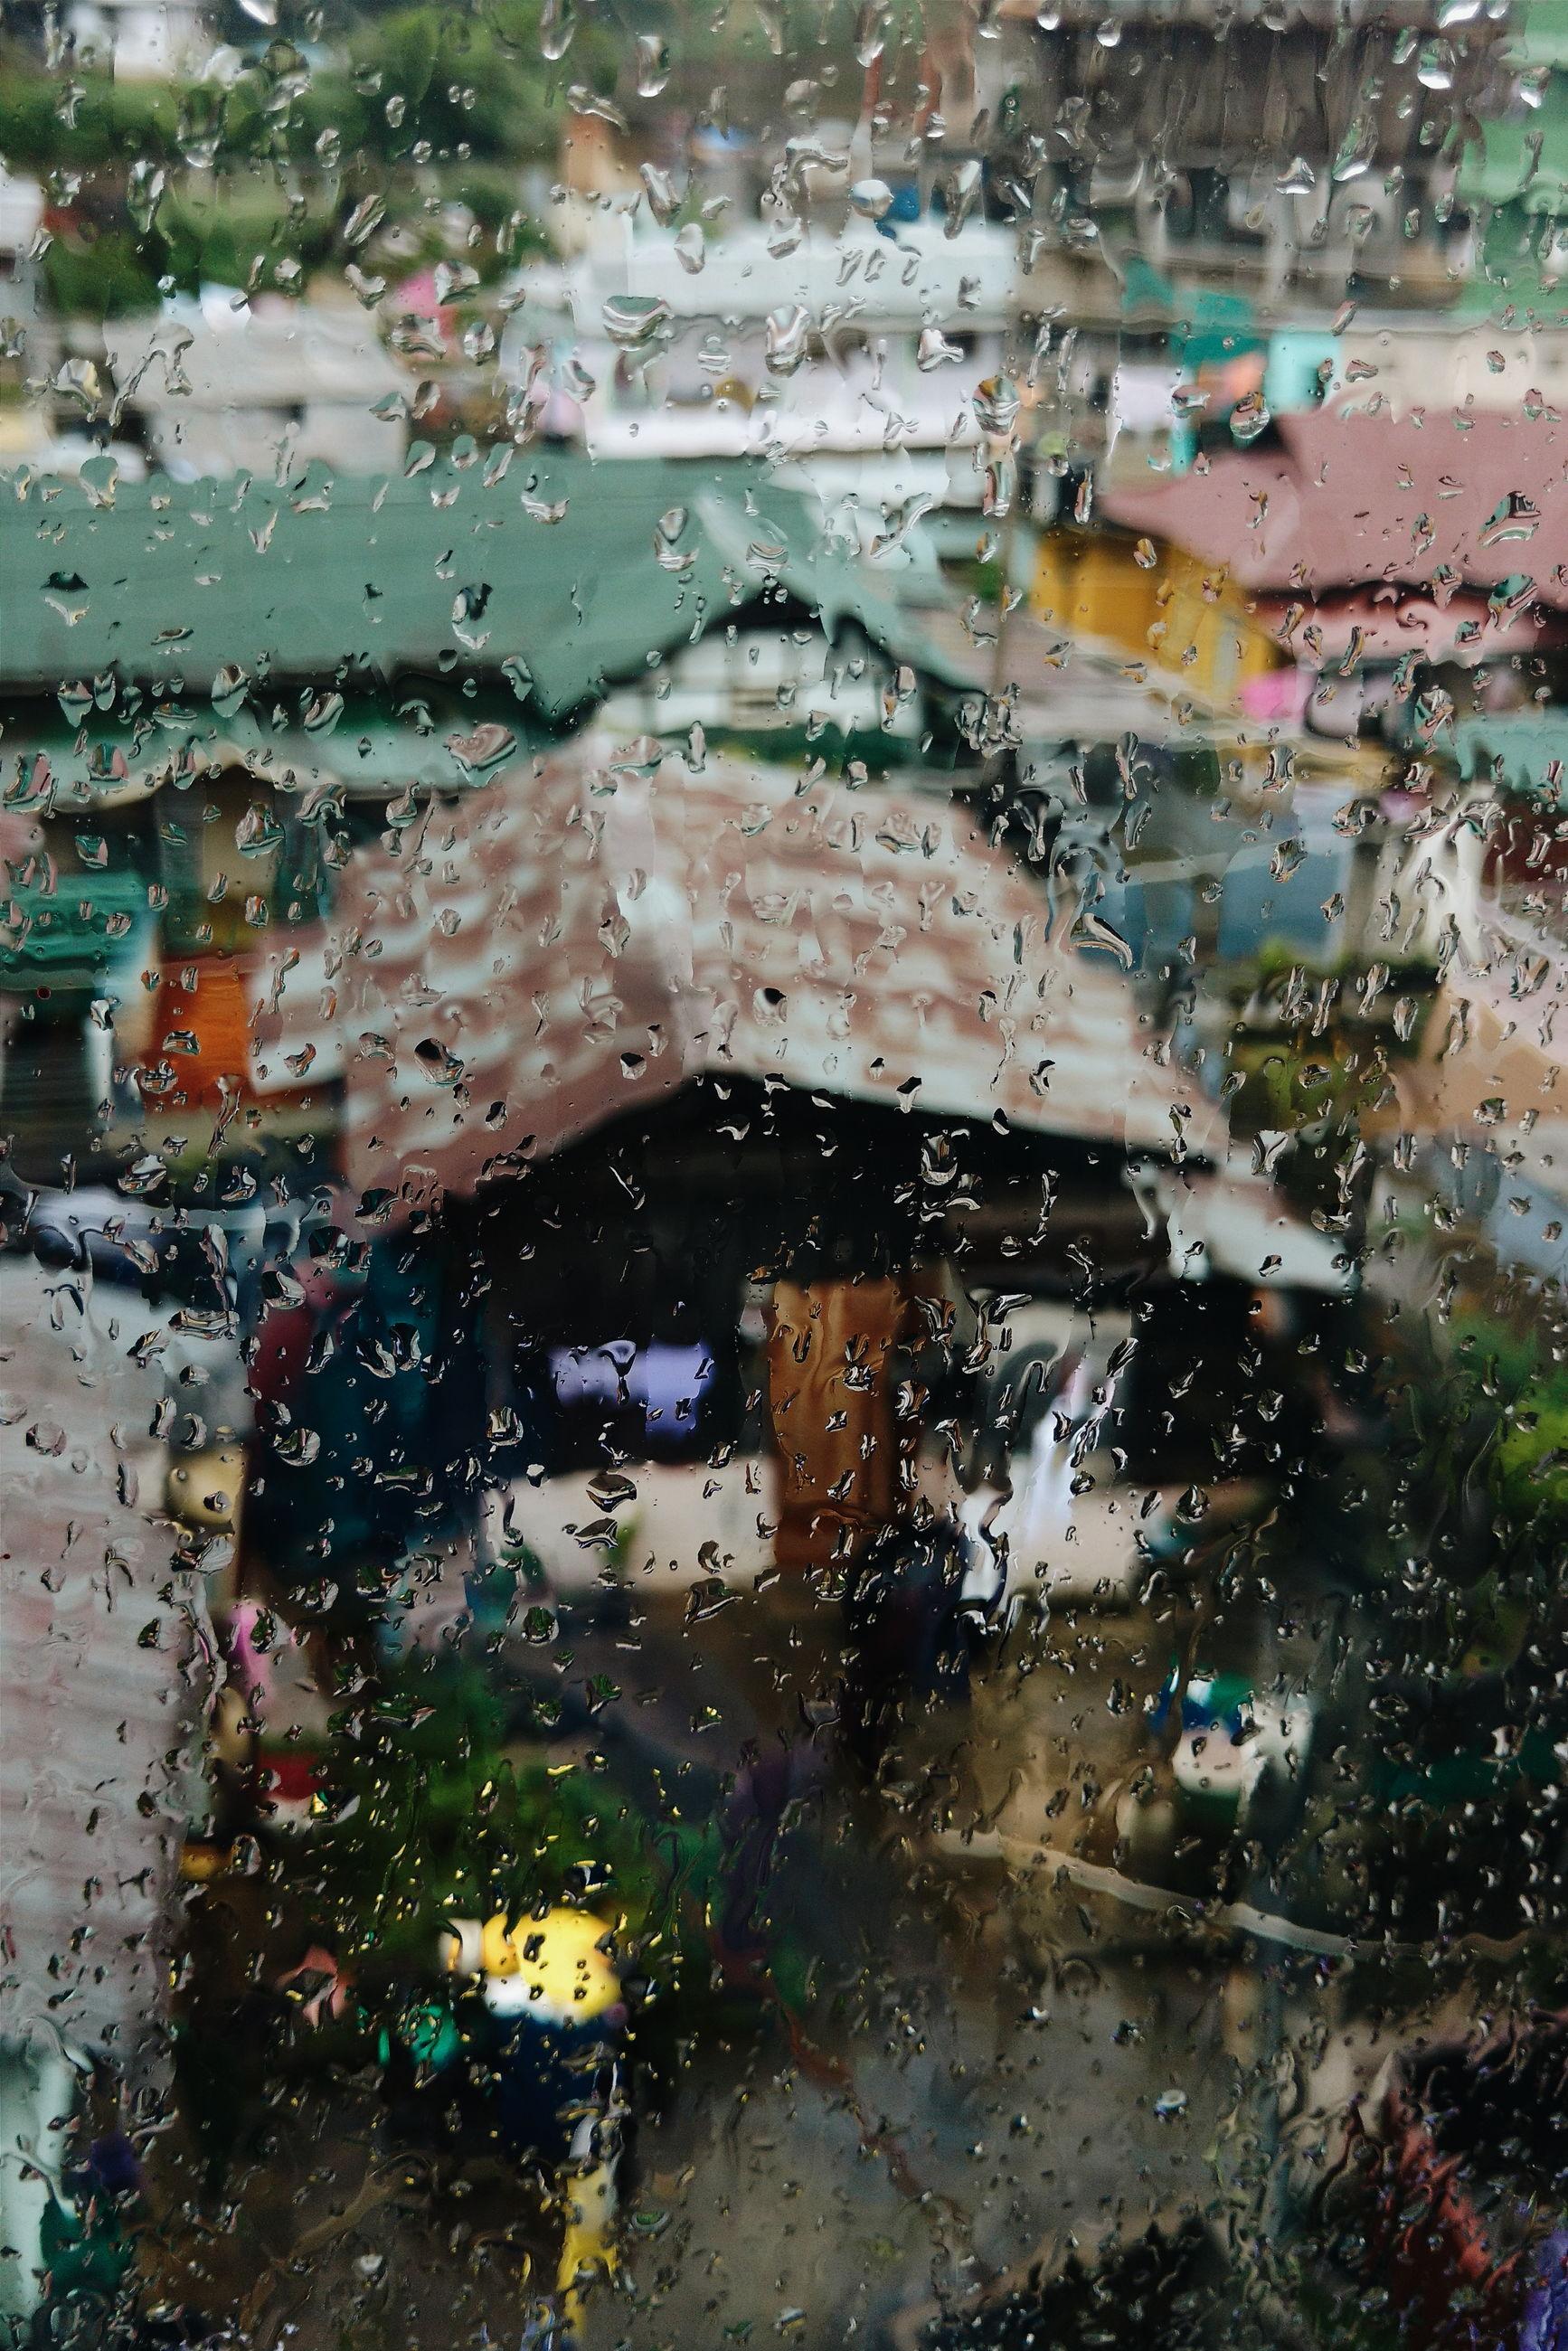 wet, water, rain, season, land vehicle, mode of transport, monsoon, road, city, weather, rainy season, focus on foreground, no people, day, outdoors, close-up, city street, city life